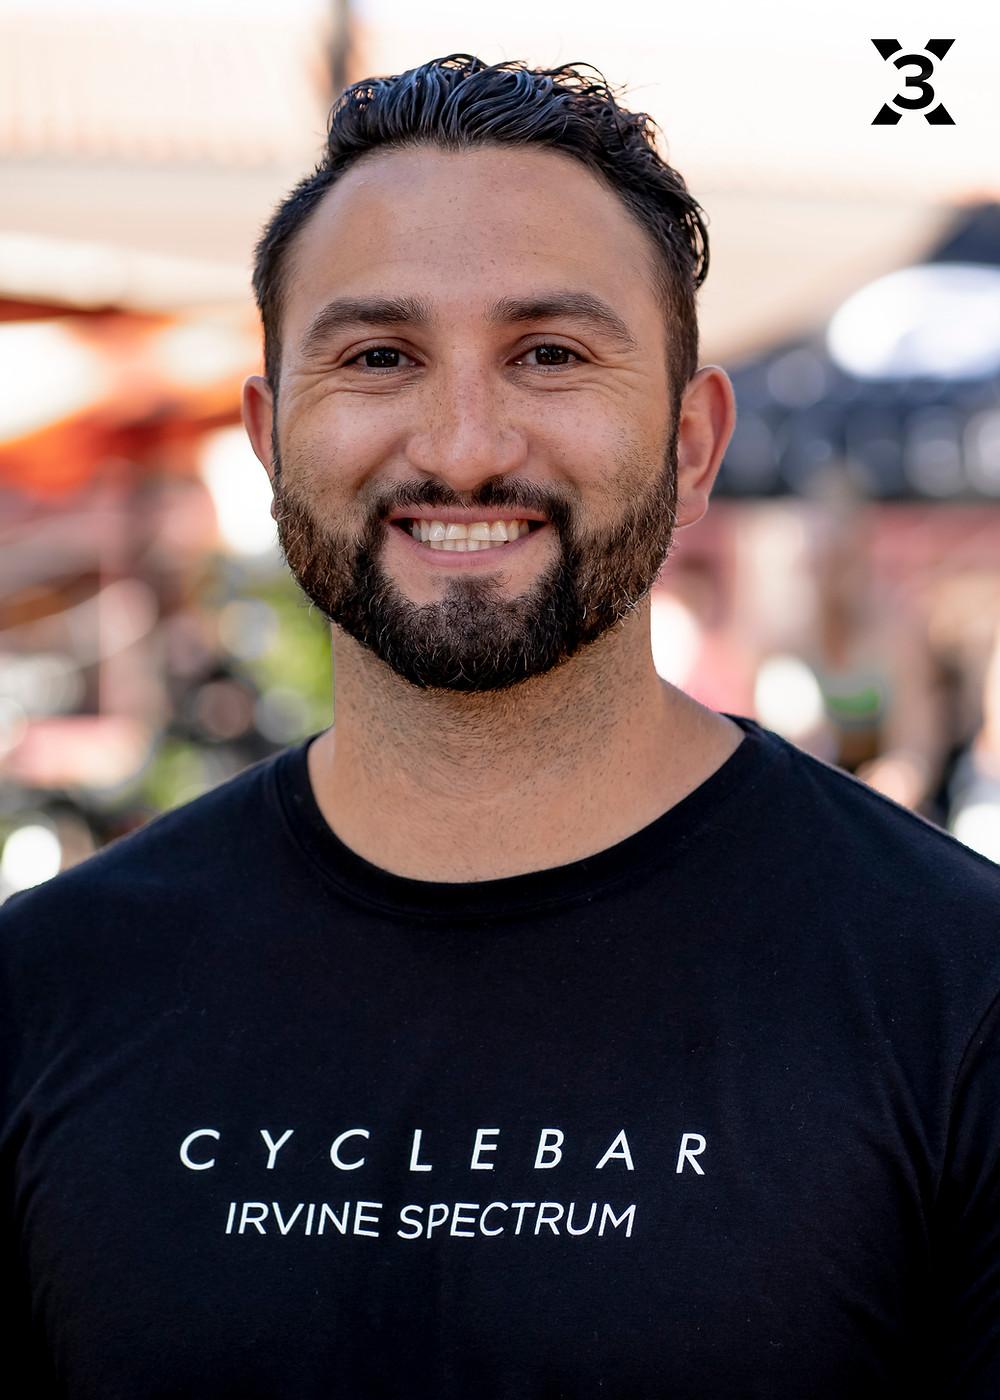 Frank Udavcak is a videographer in Irvine, CA